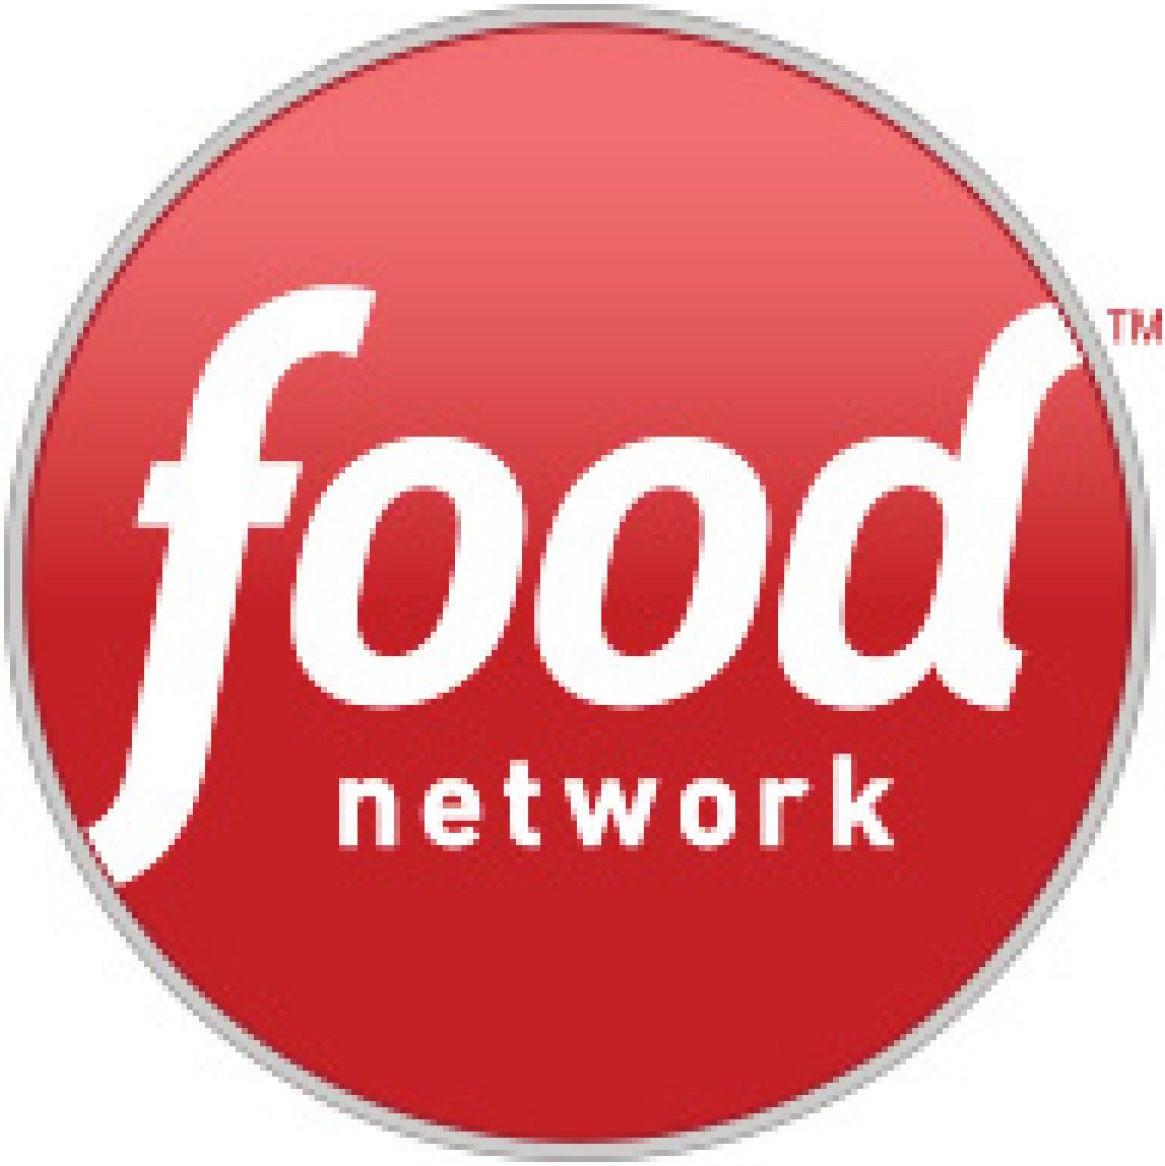 FN-3D-Logo-336x252.jpg.rend.sniipadlarge copy.jpeg